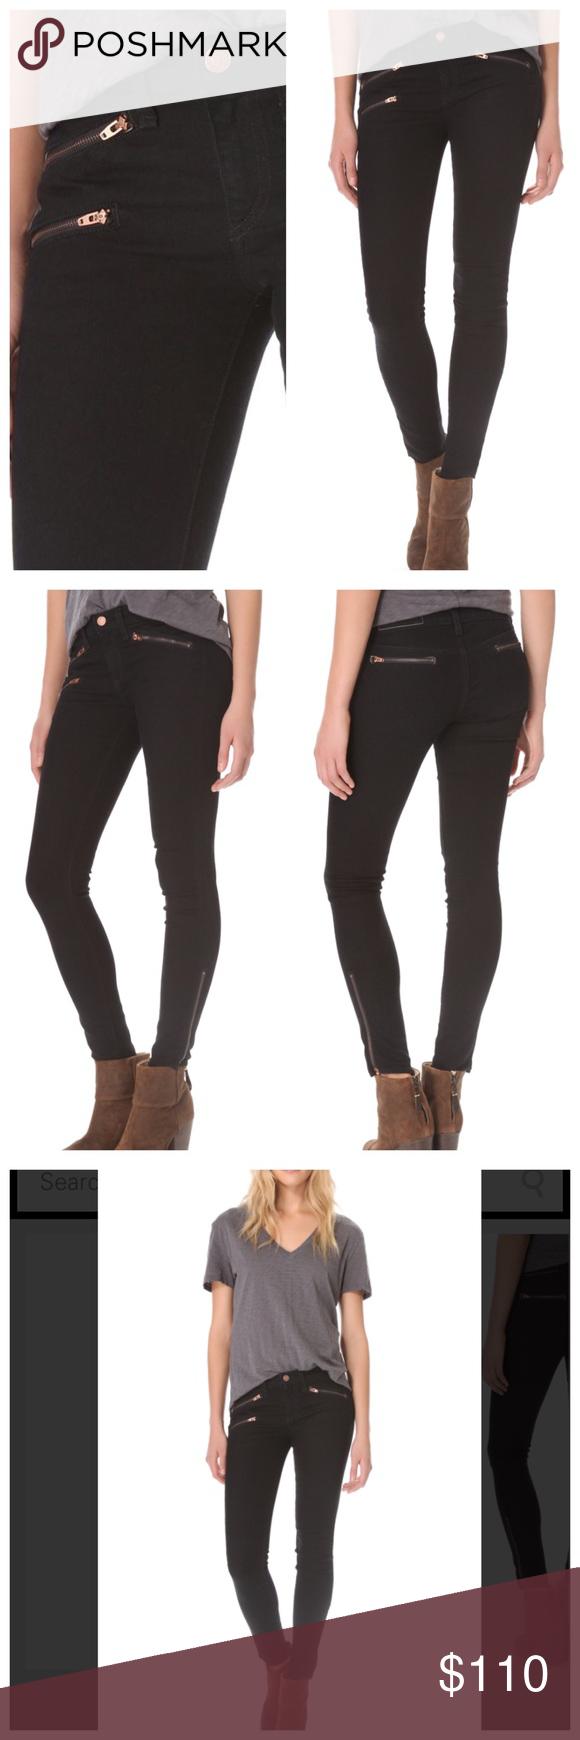 Rag & Bone Skinny Moto Jeans NWOT Rag & Bone Skinny Moto Jeans NWOT rag & bone Jeans Skinny